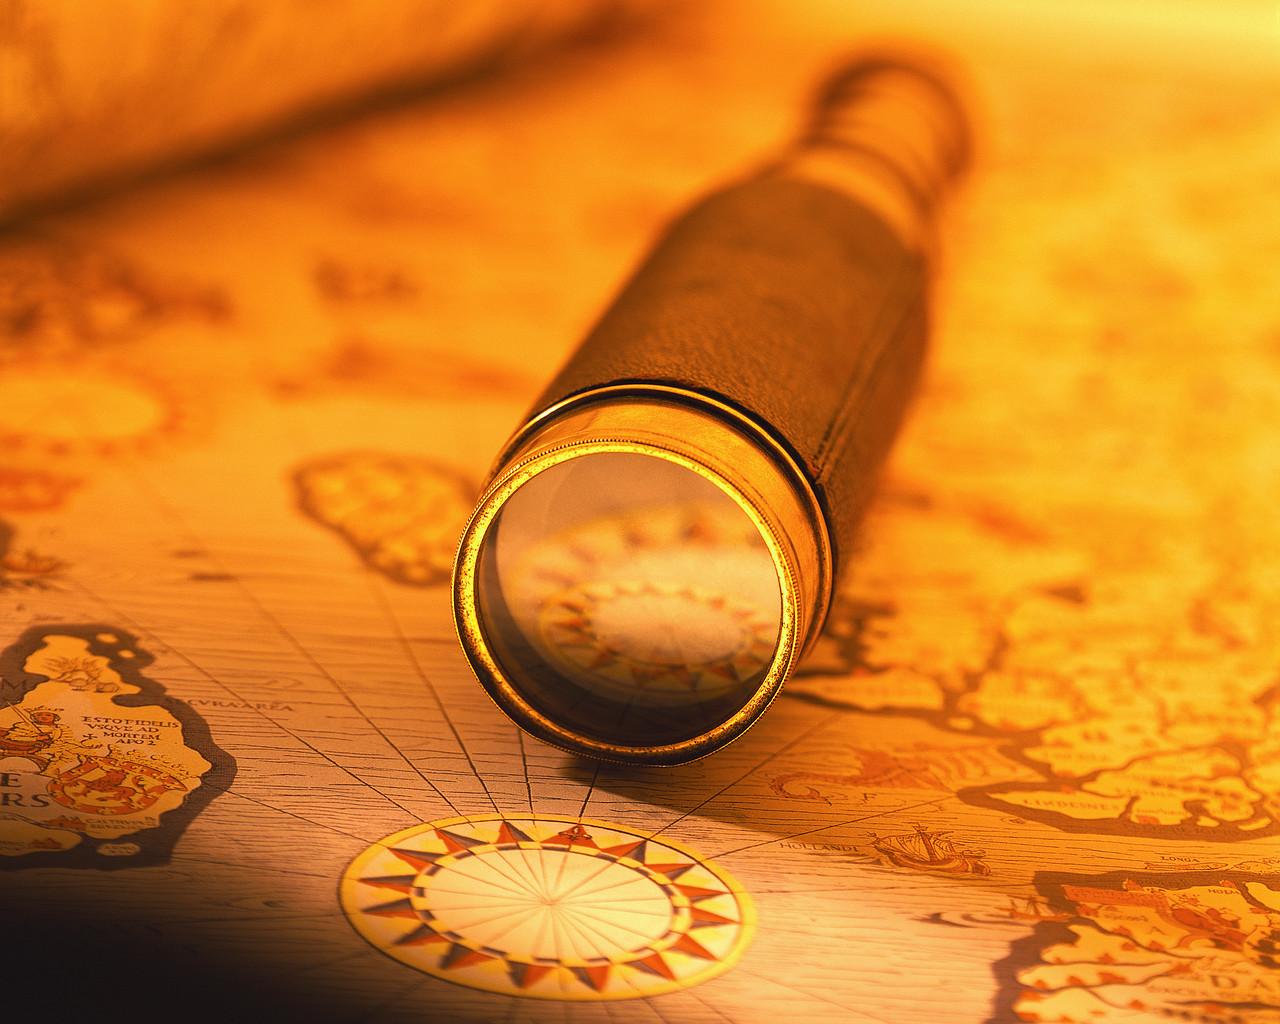 Spyglass on a Map